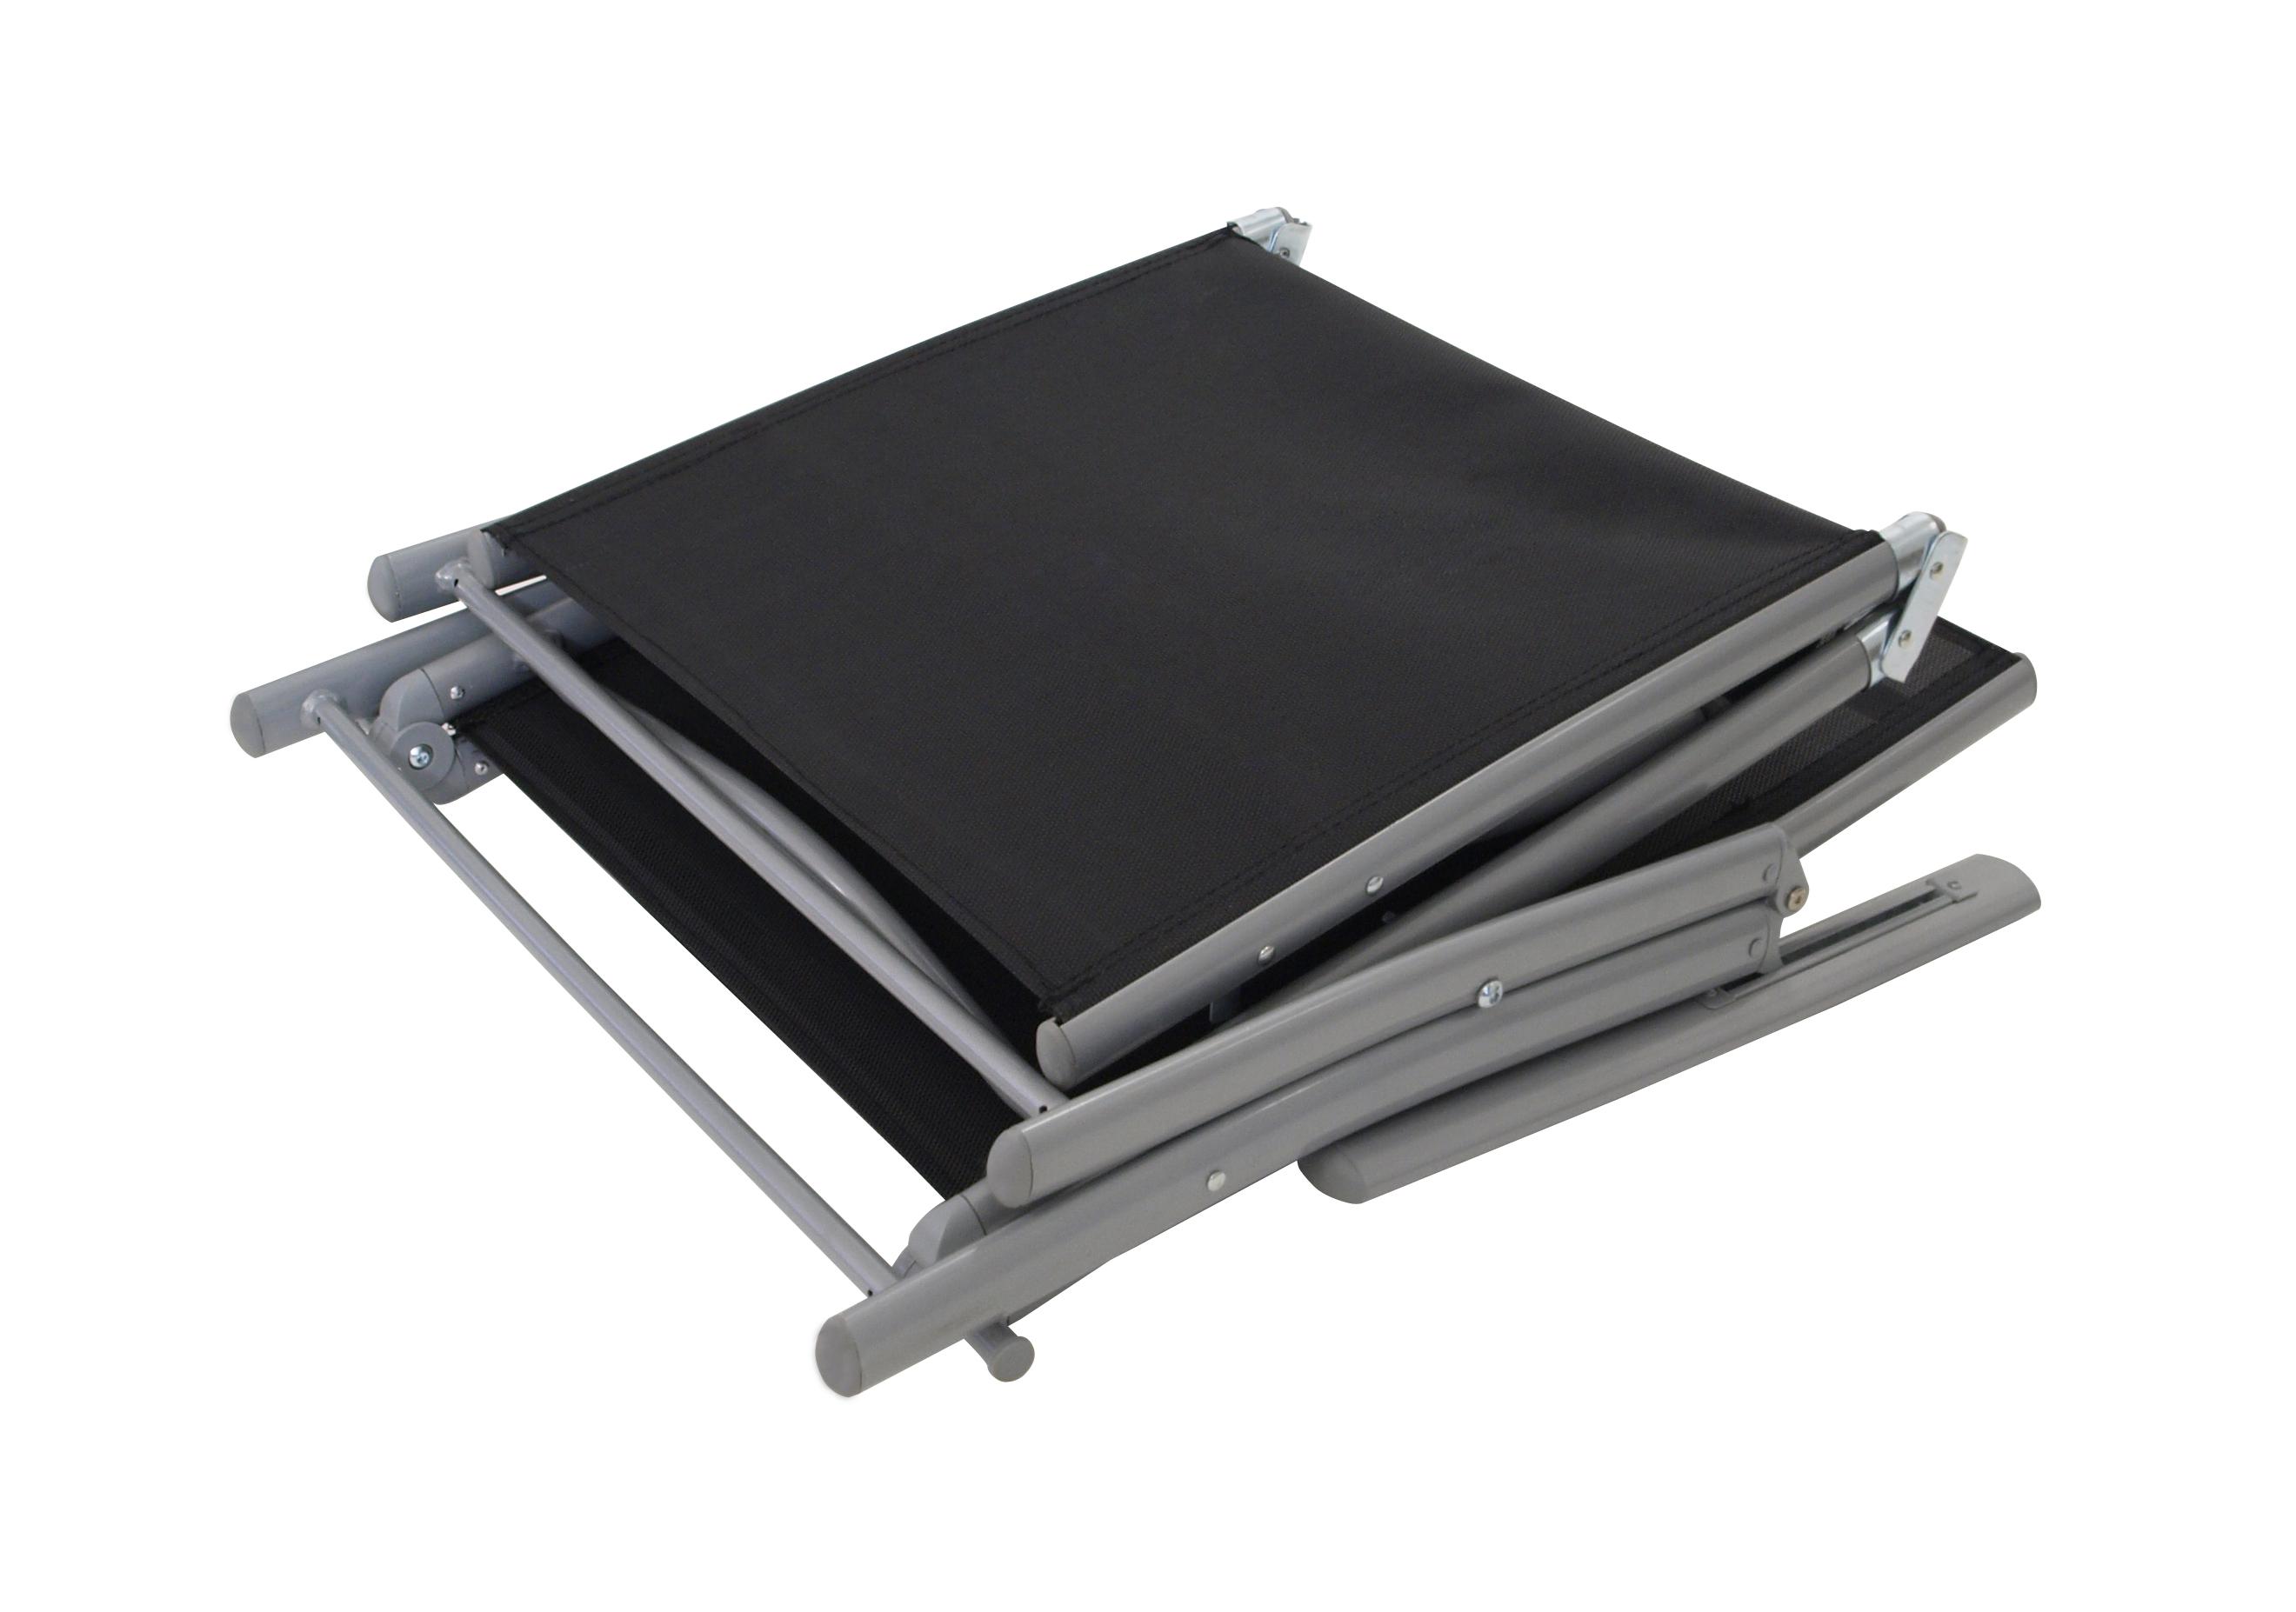 Klappliege ACAPULCO, Stahl / Aluminium + Kunstgewebe schwarz, klappbar